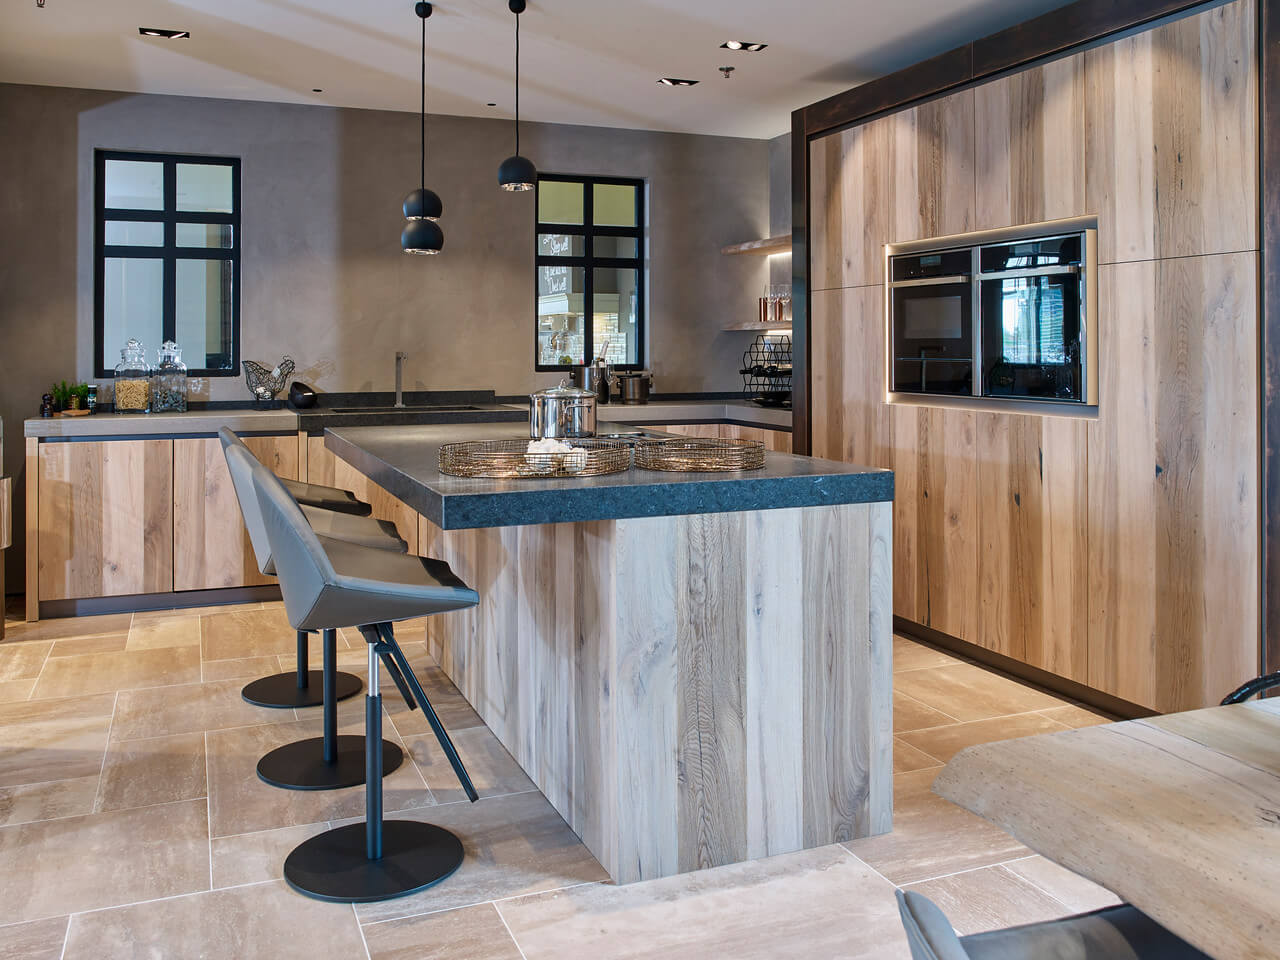 De mooiste keukens van Tieleman Keukens